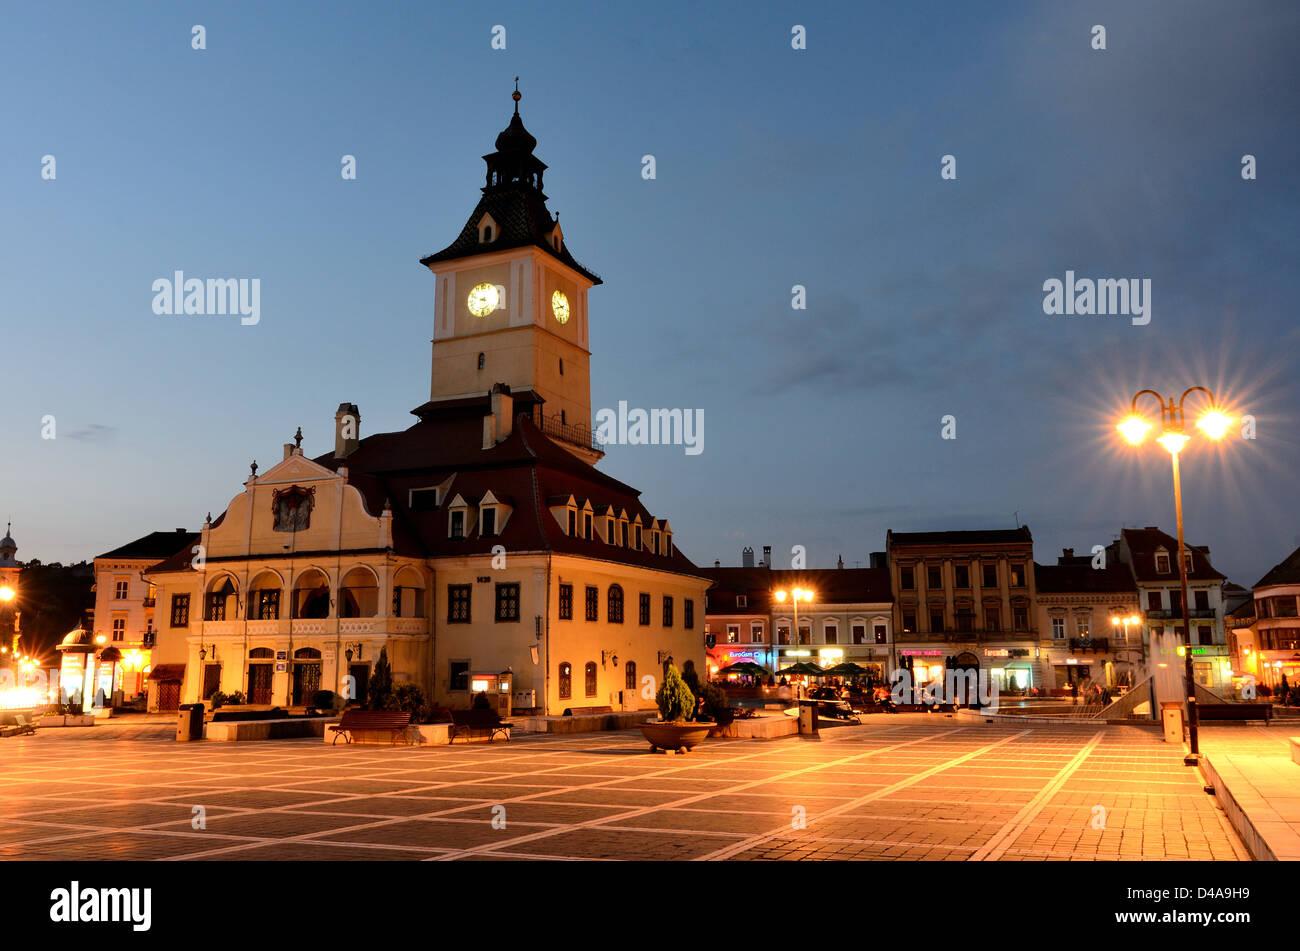 Brasov Council Square, twilight view, Transylvania, Romania - Stock Image